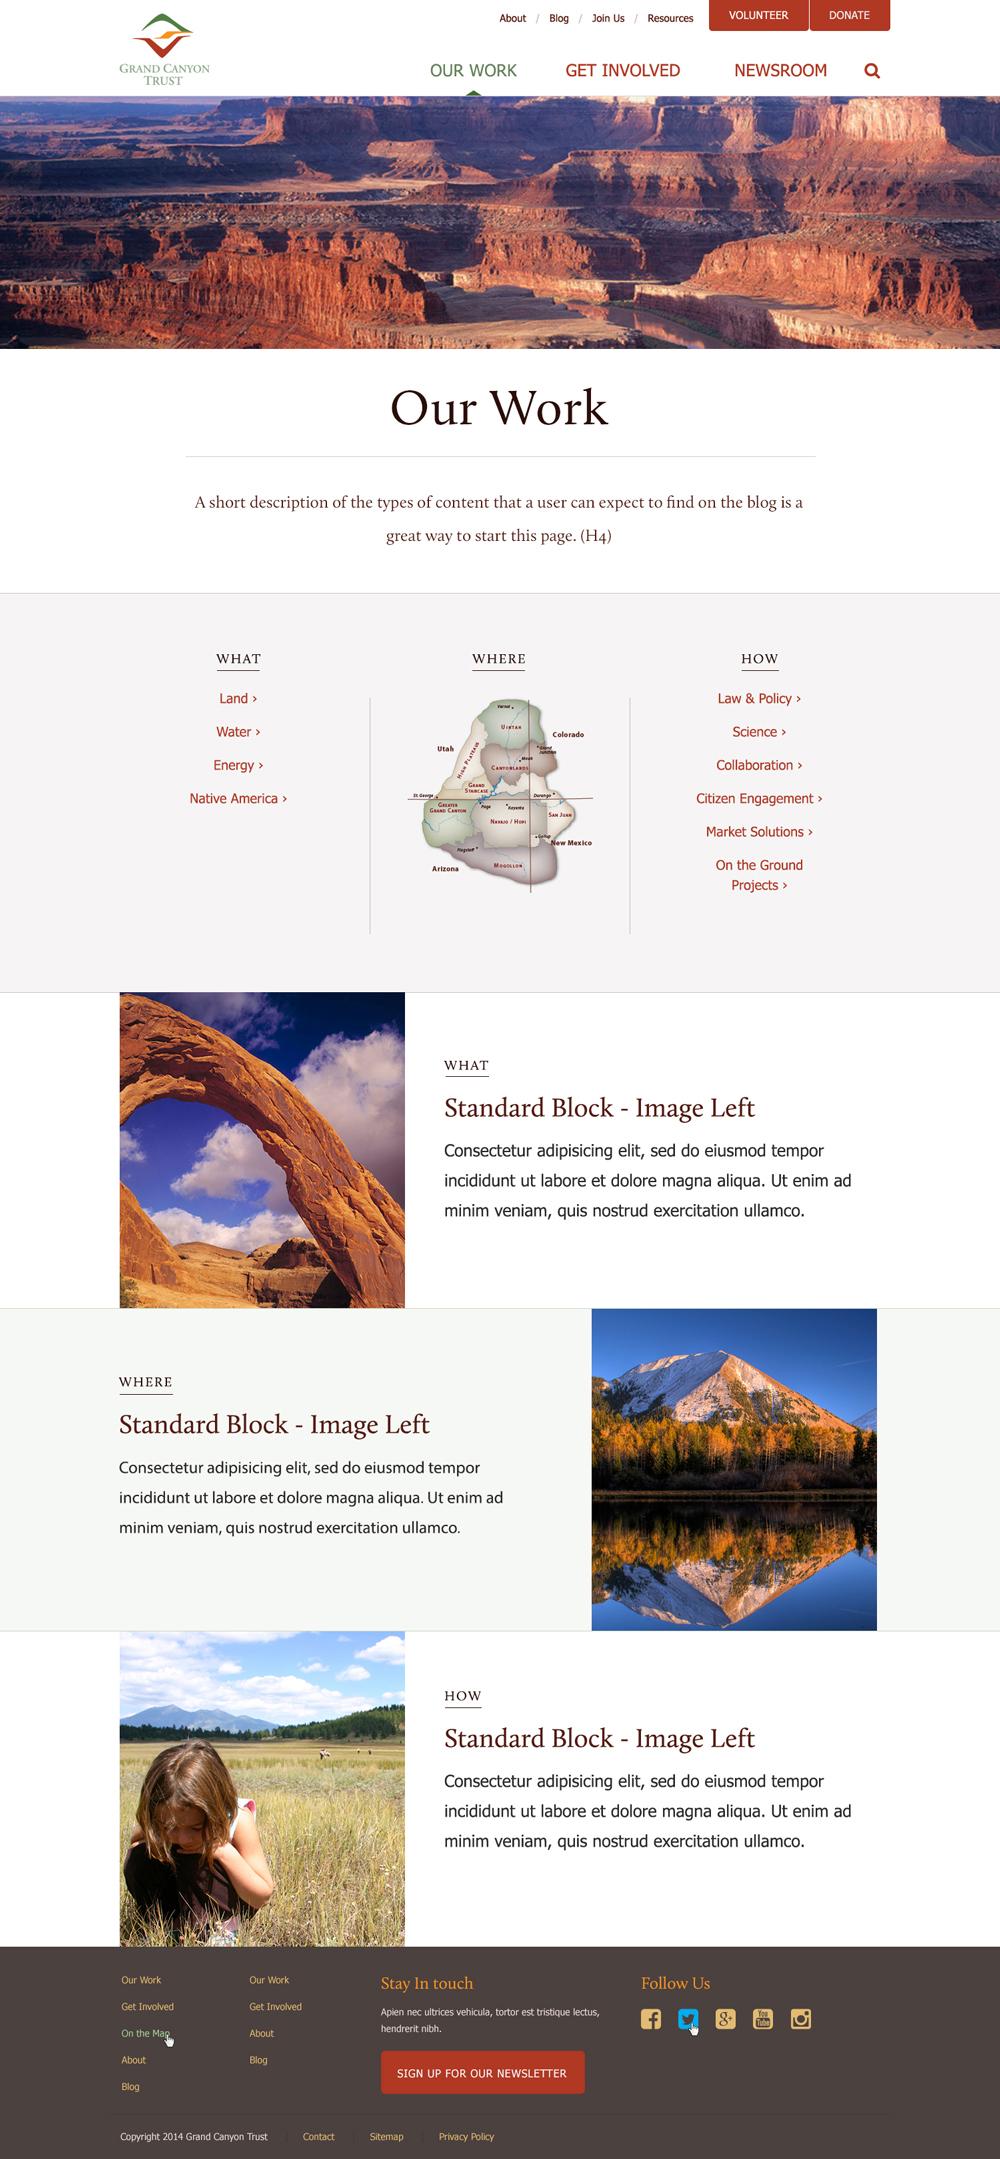 gct-designs-nh-work_v2-sm